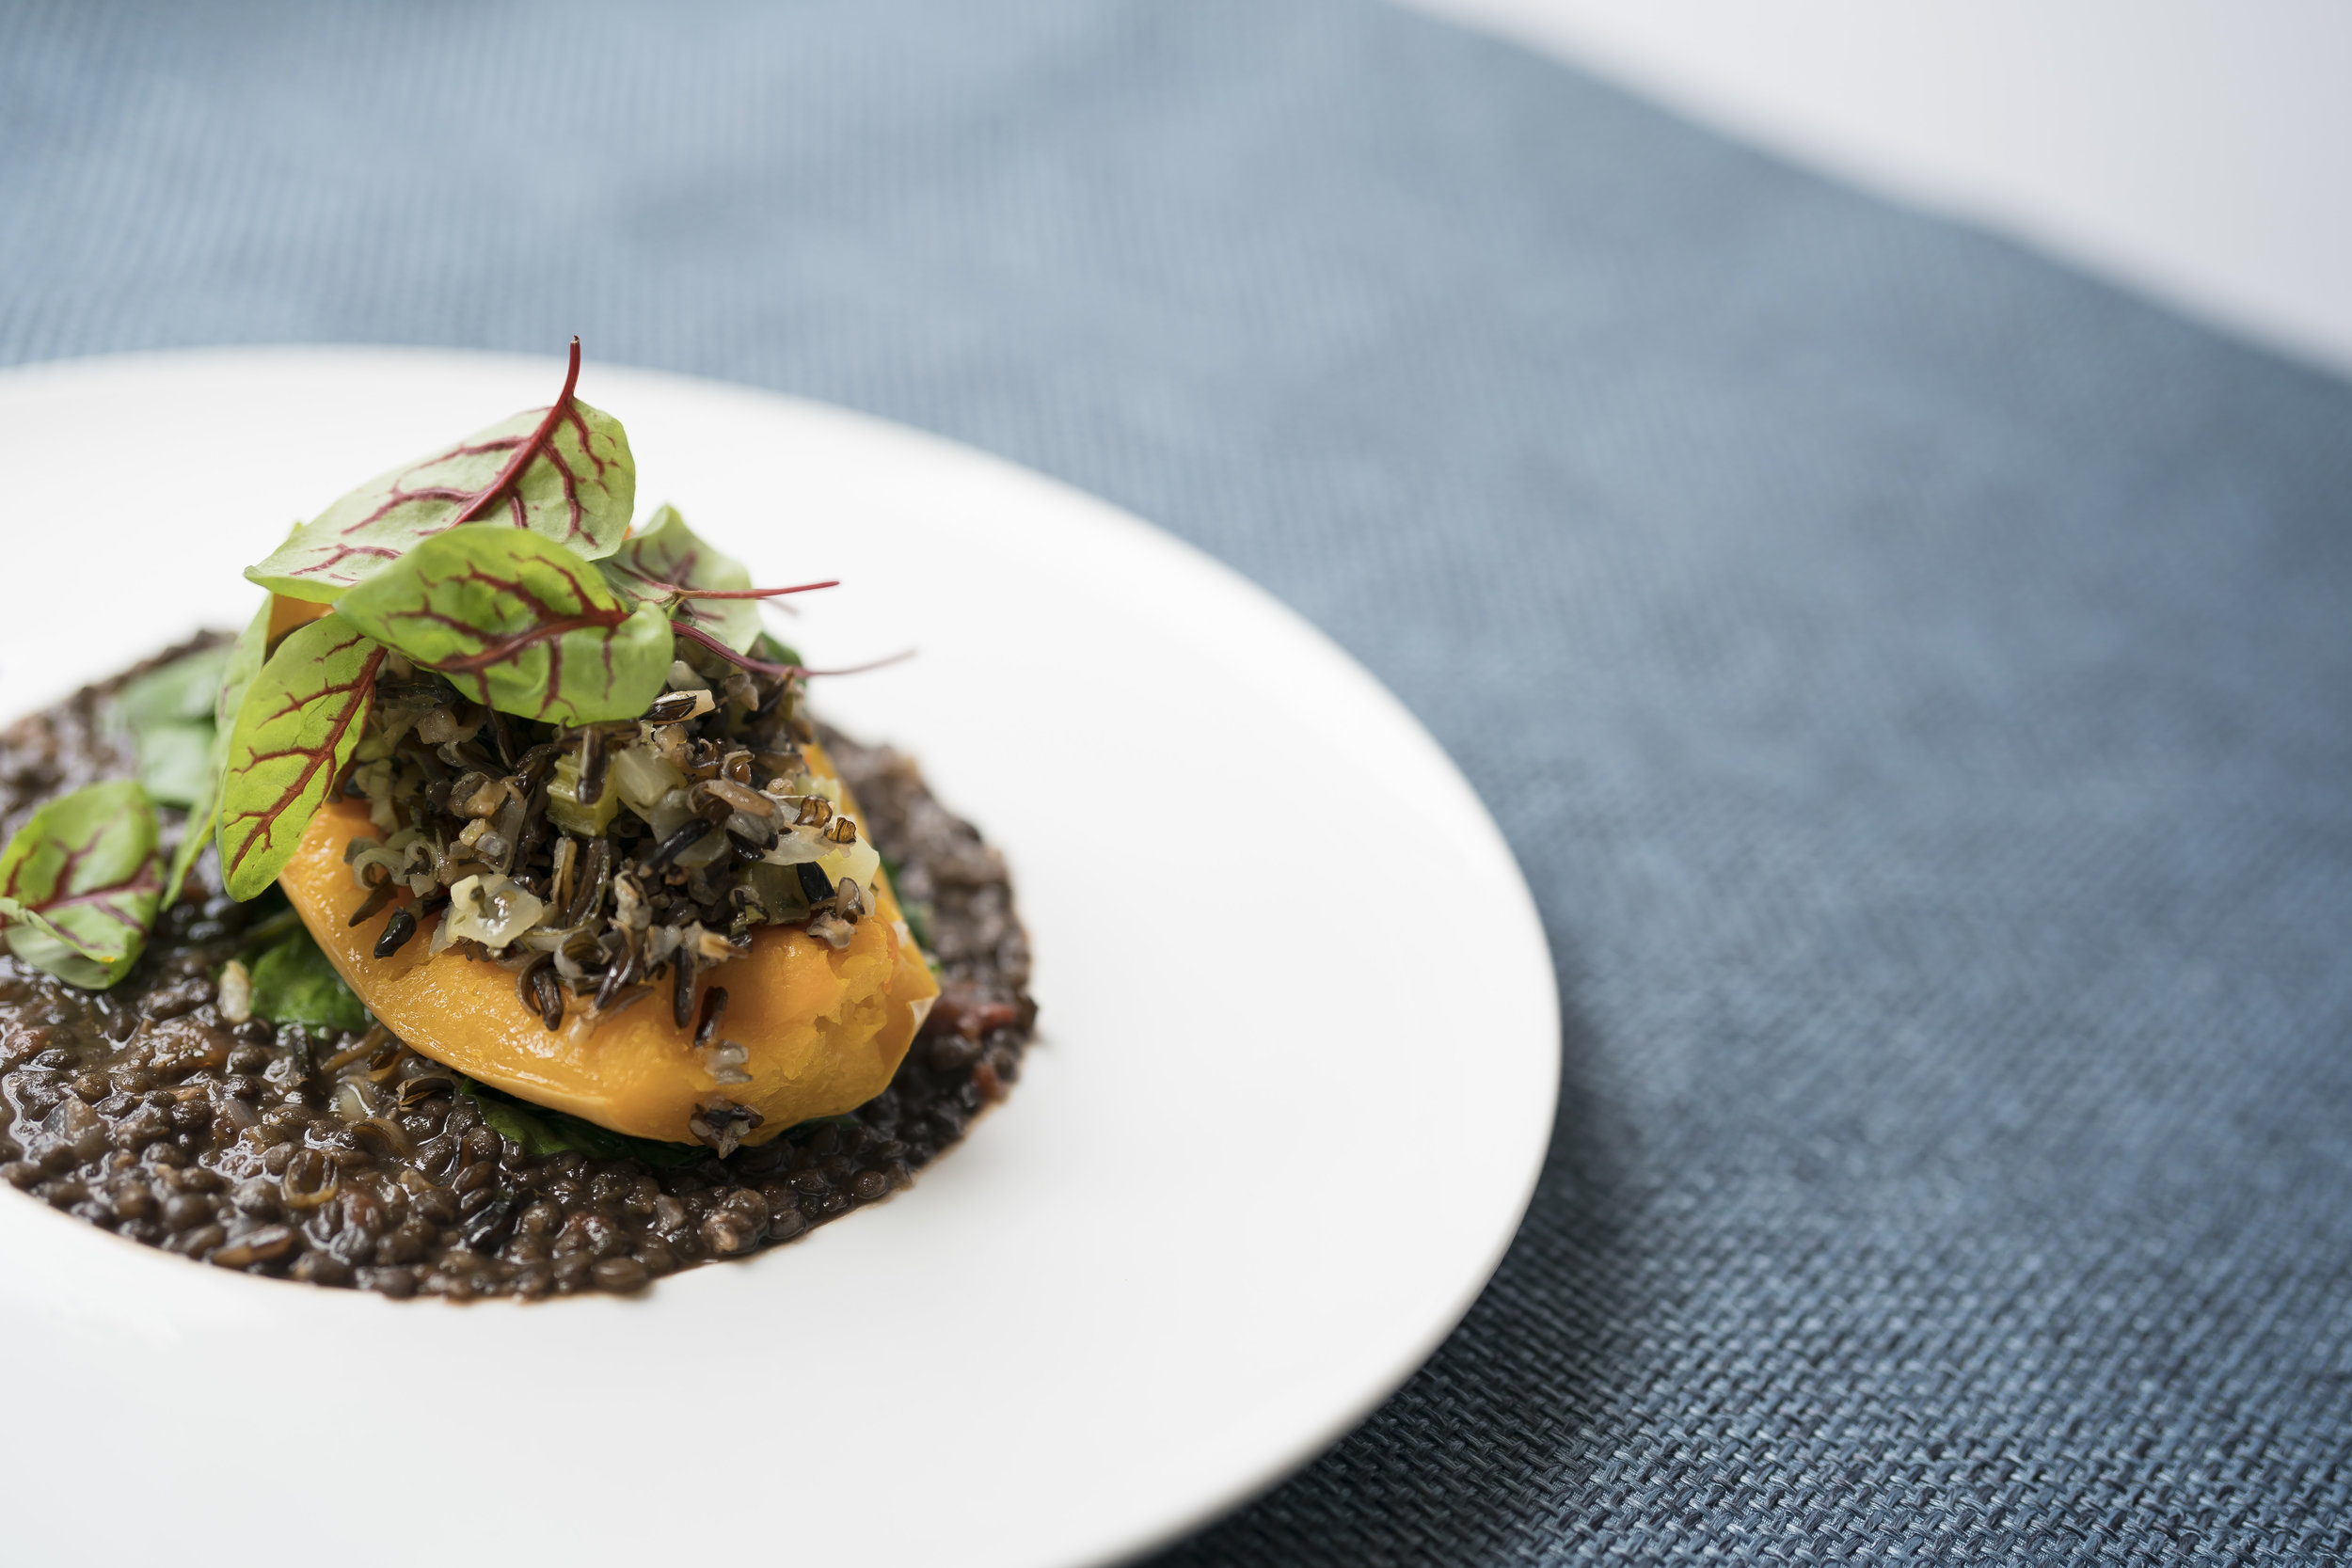 Roasted Butternut Squash, Lentil Stew, Wild Rice and Braised Greens_Main_Fall 18 GP Tasting_BH_30.JPG